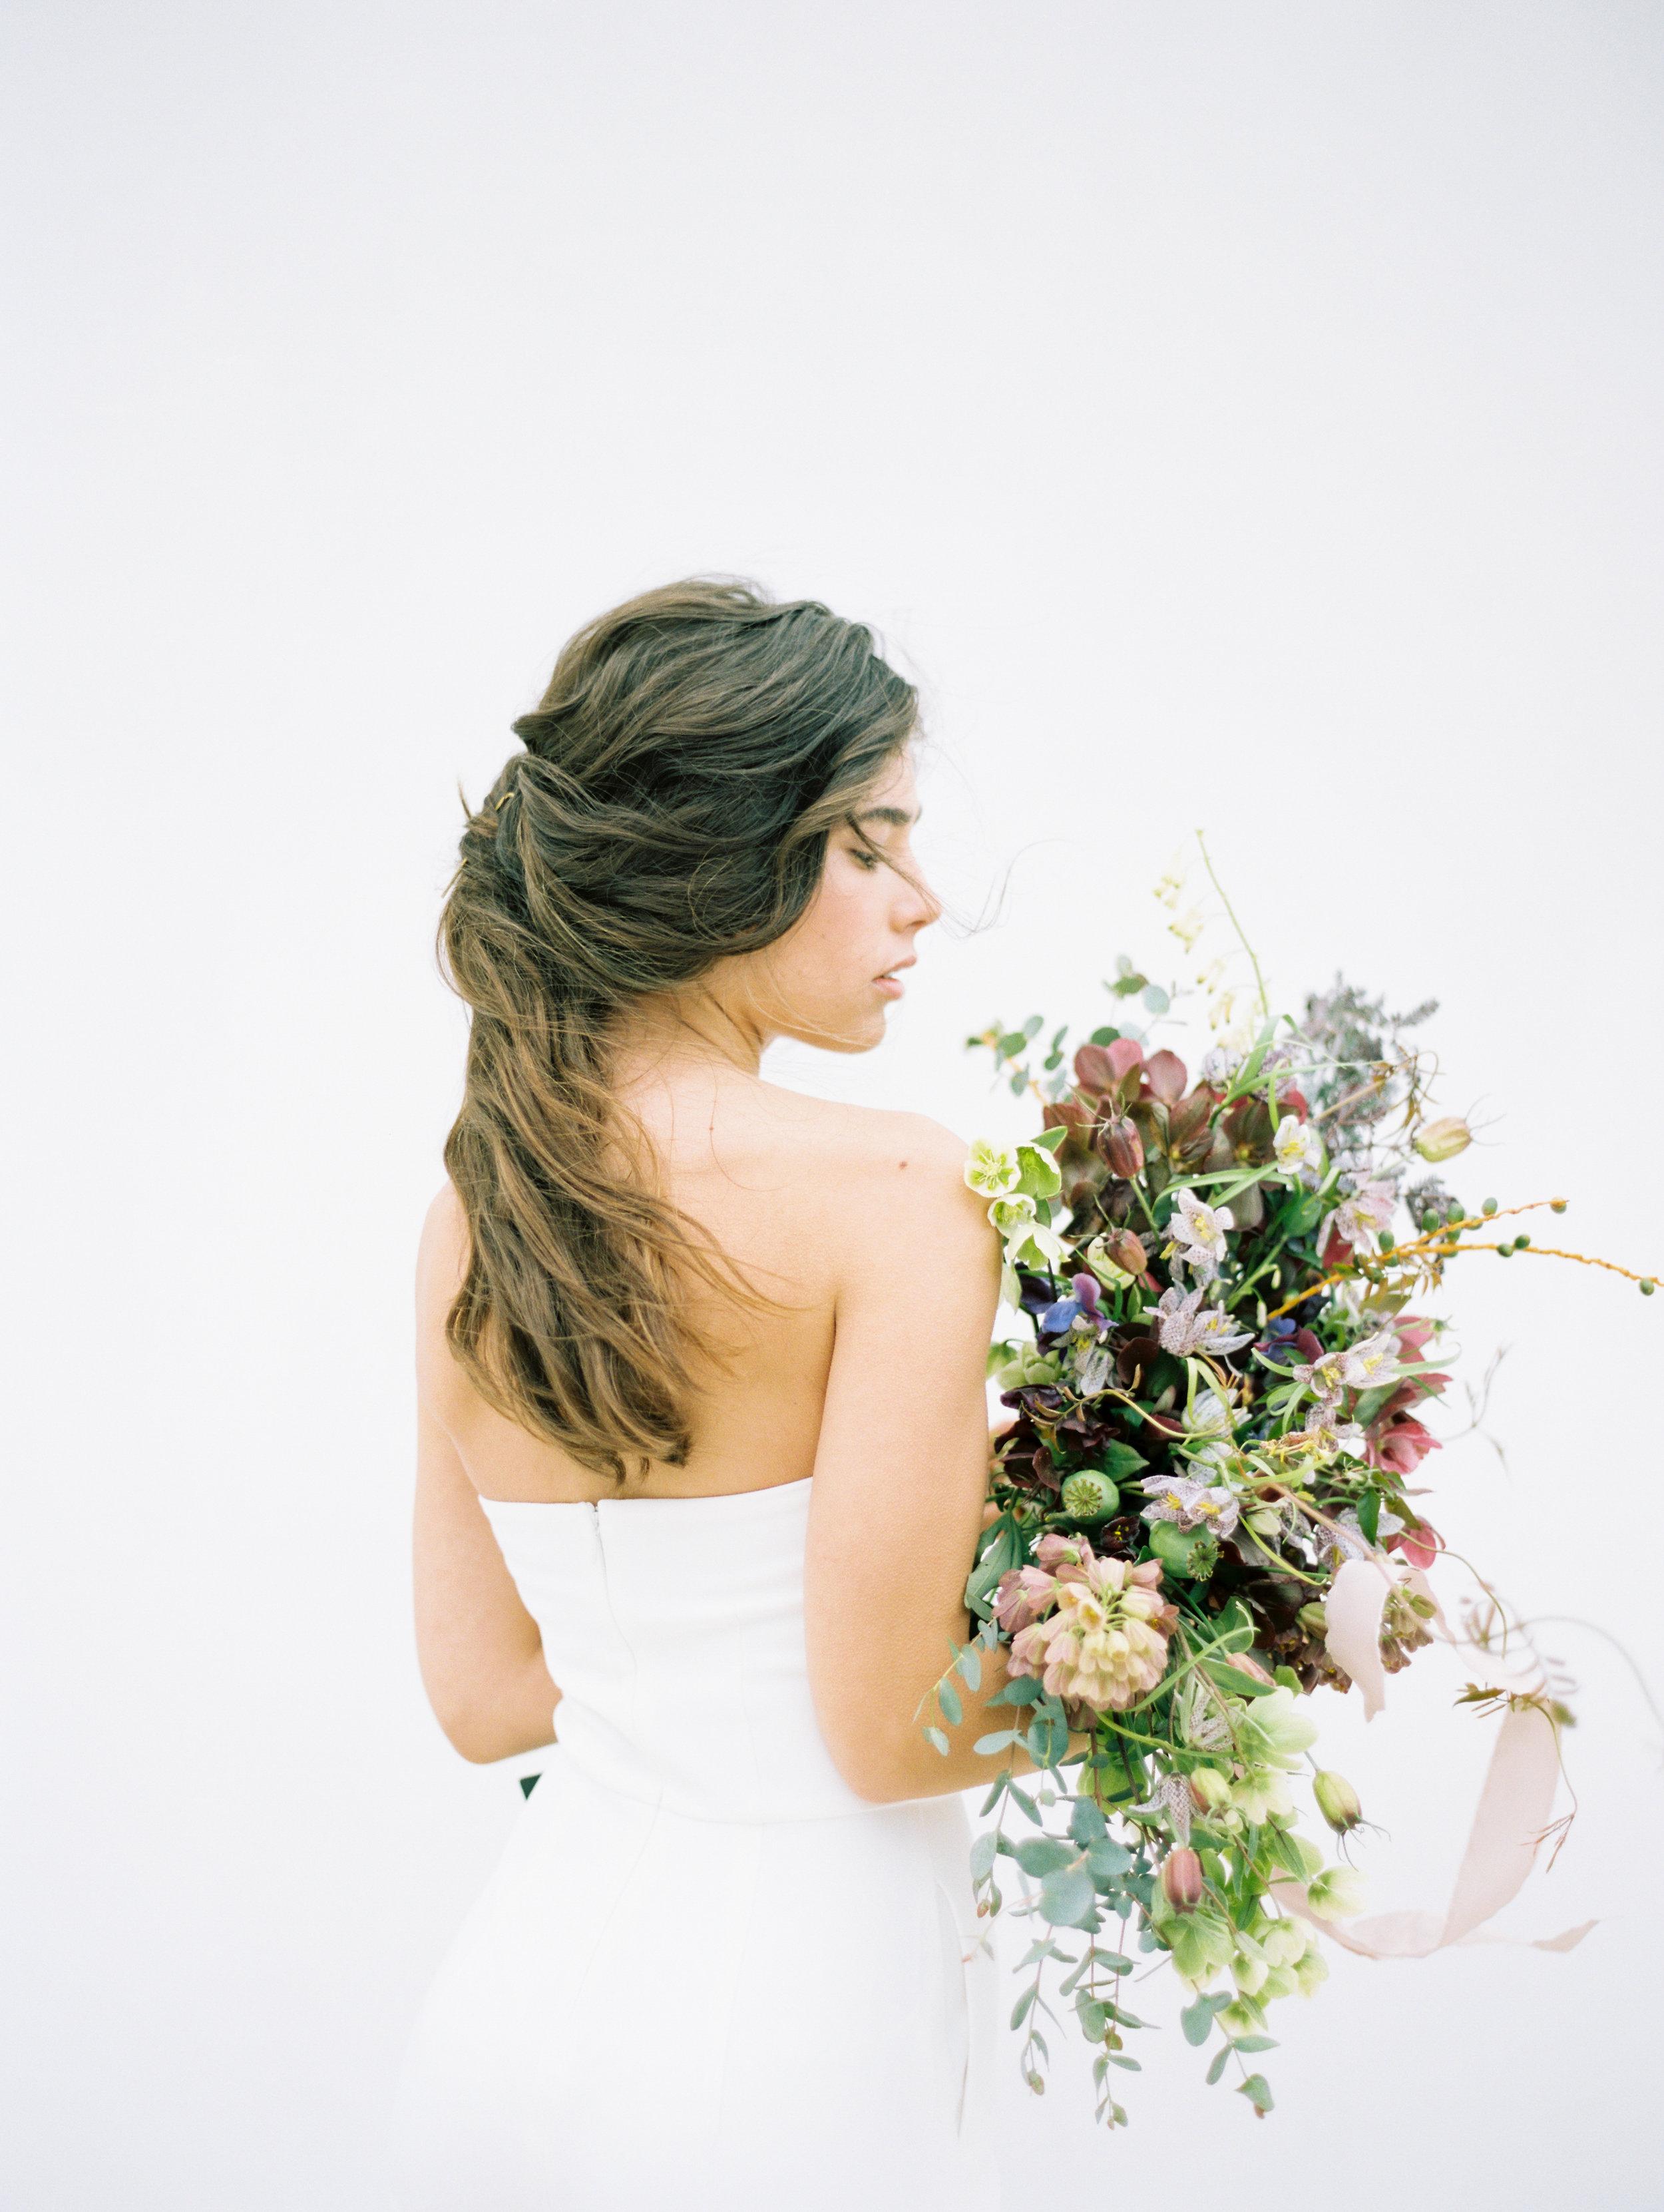 LaurenKinsey_JessicaSloane_JessicaZimmerman_GreeceWeddingPhotographer_AlysBeach047.JPG